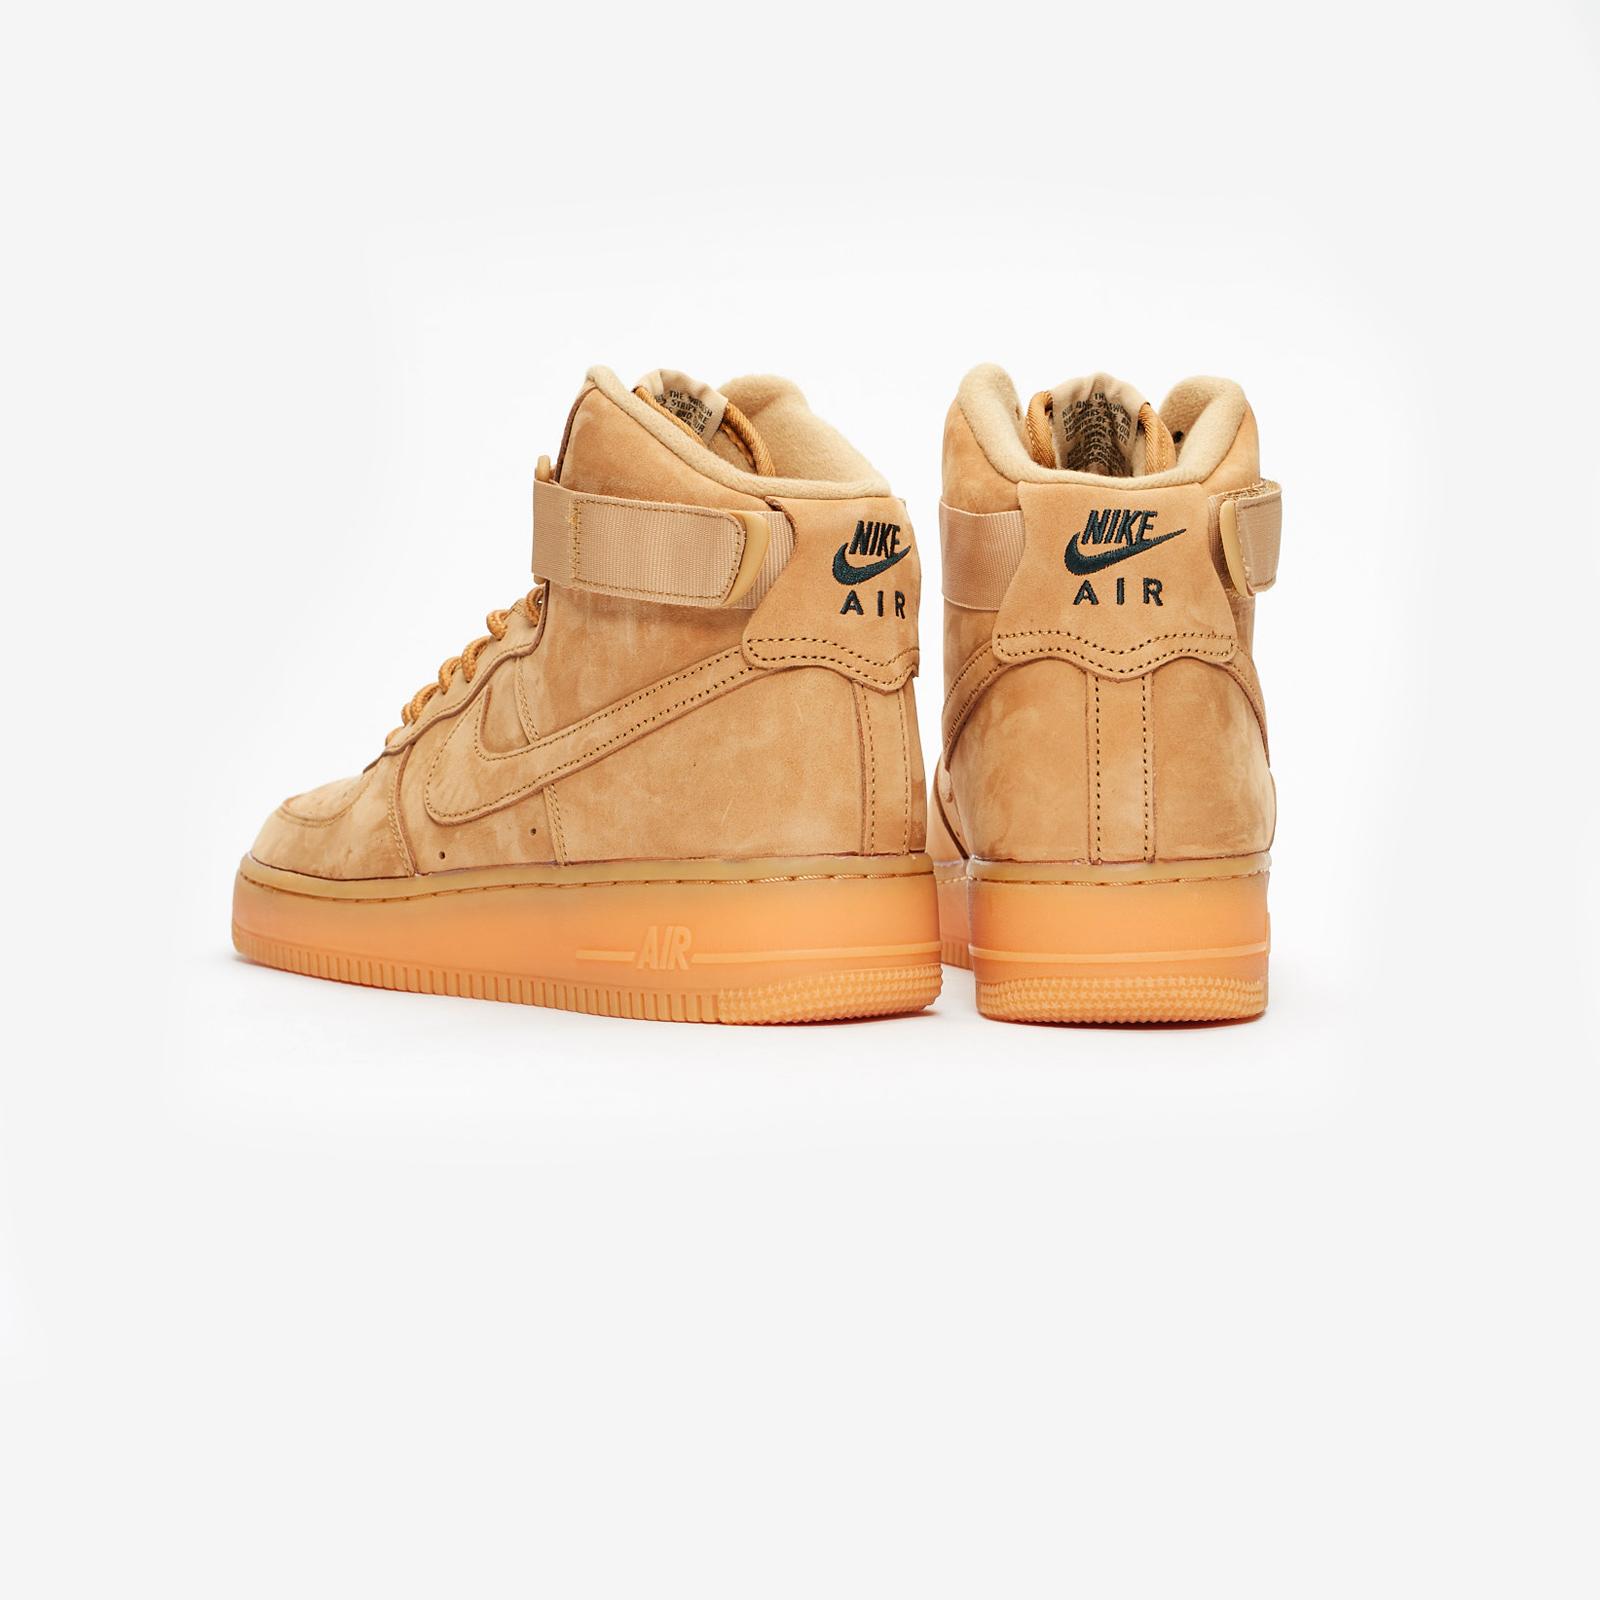 Nike Air Force 1 High 07 LV8 WB - 882096-200 - SNS | sneakers ...